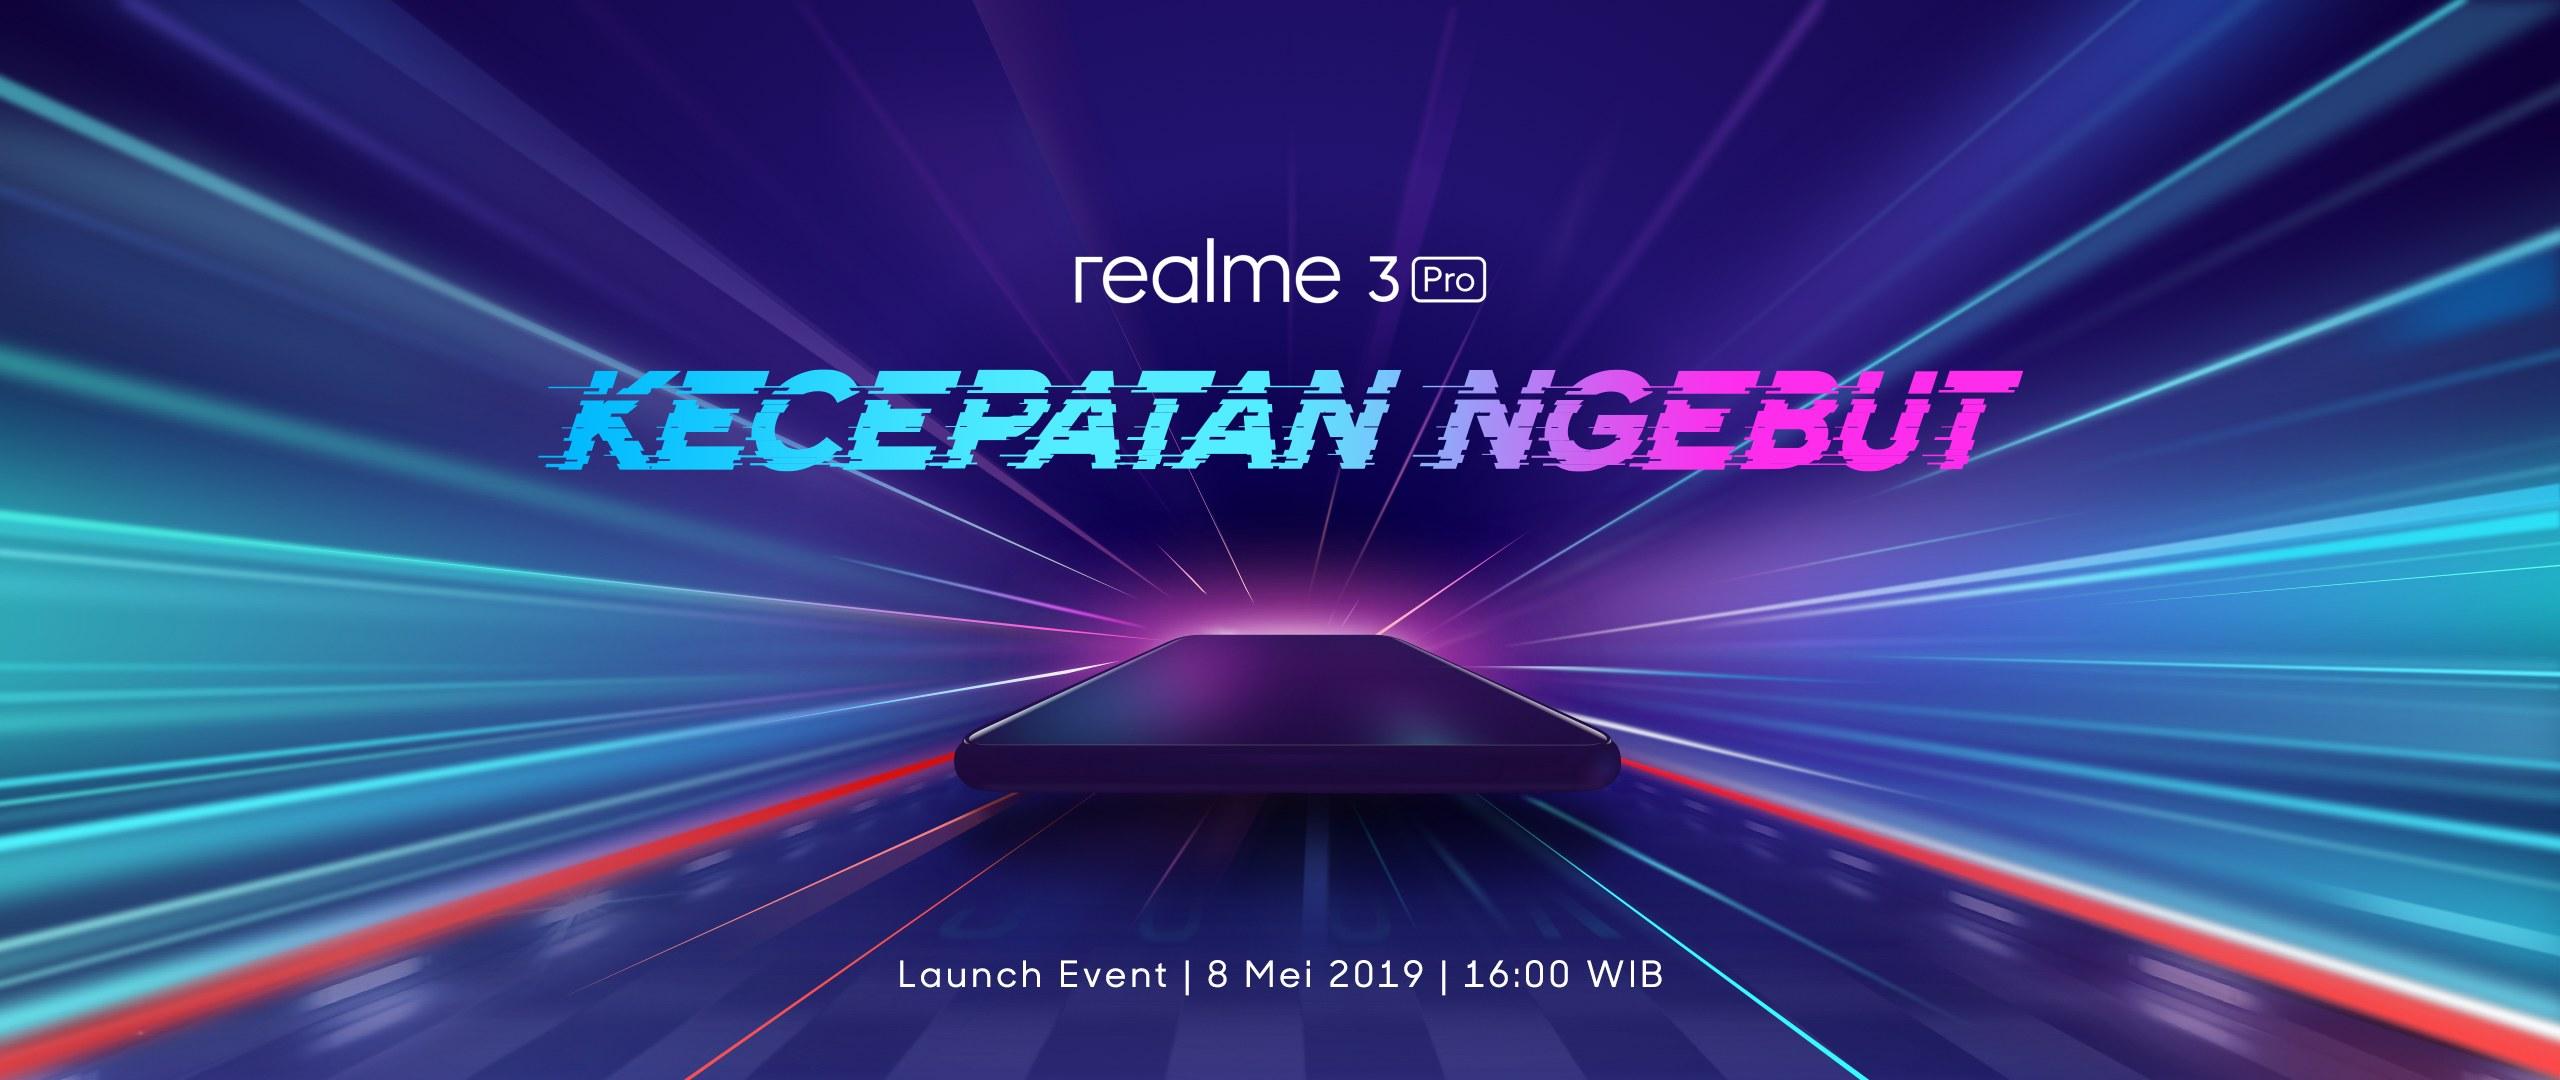 Ngebut Bareng Realme 3 Pro